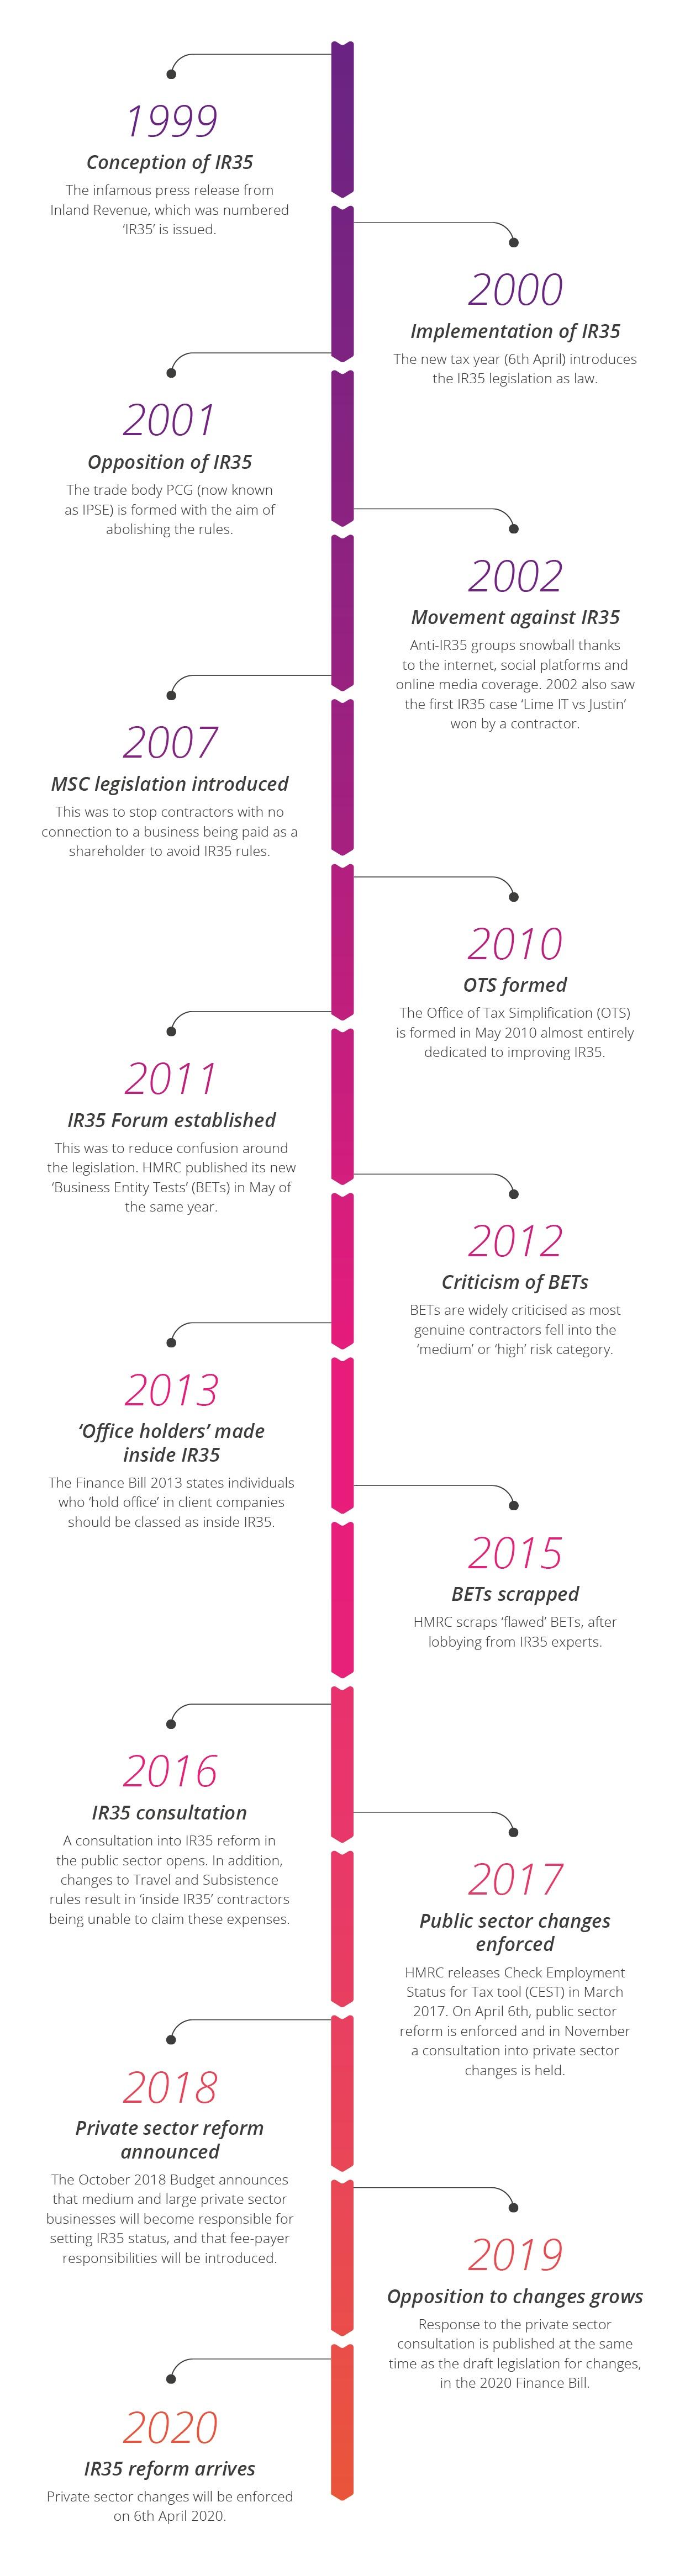 A timeline of IR35